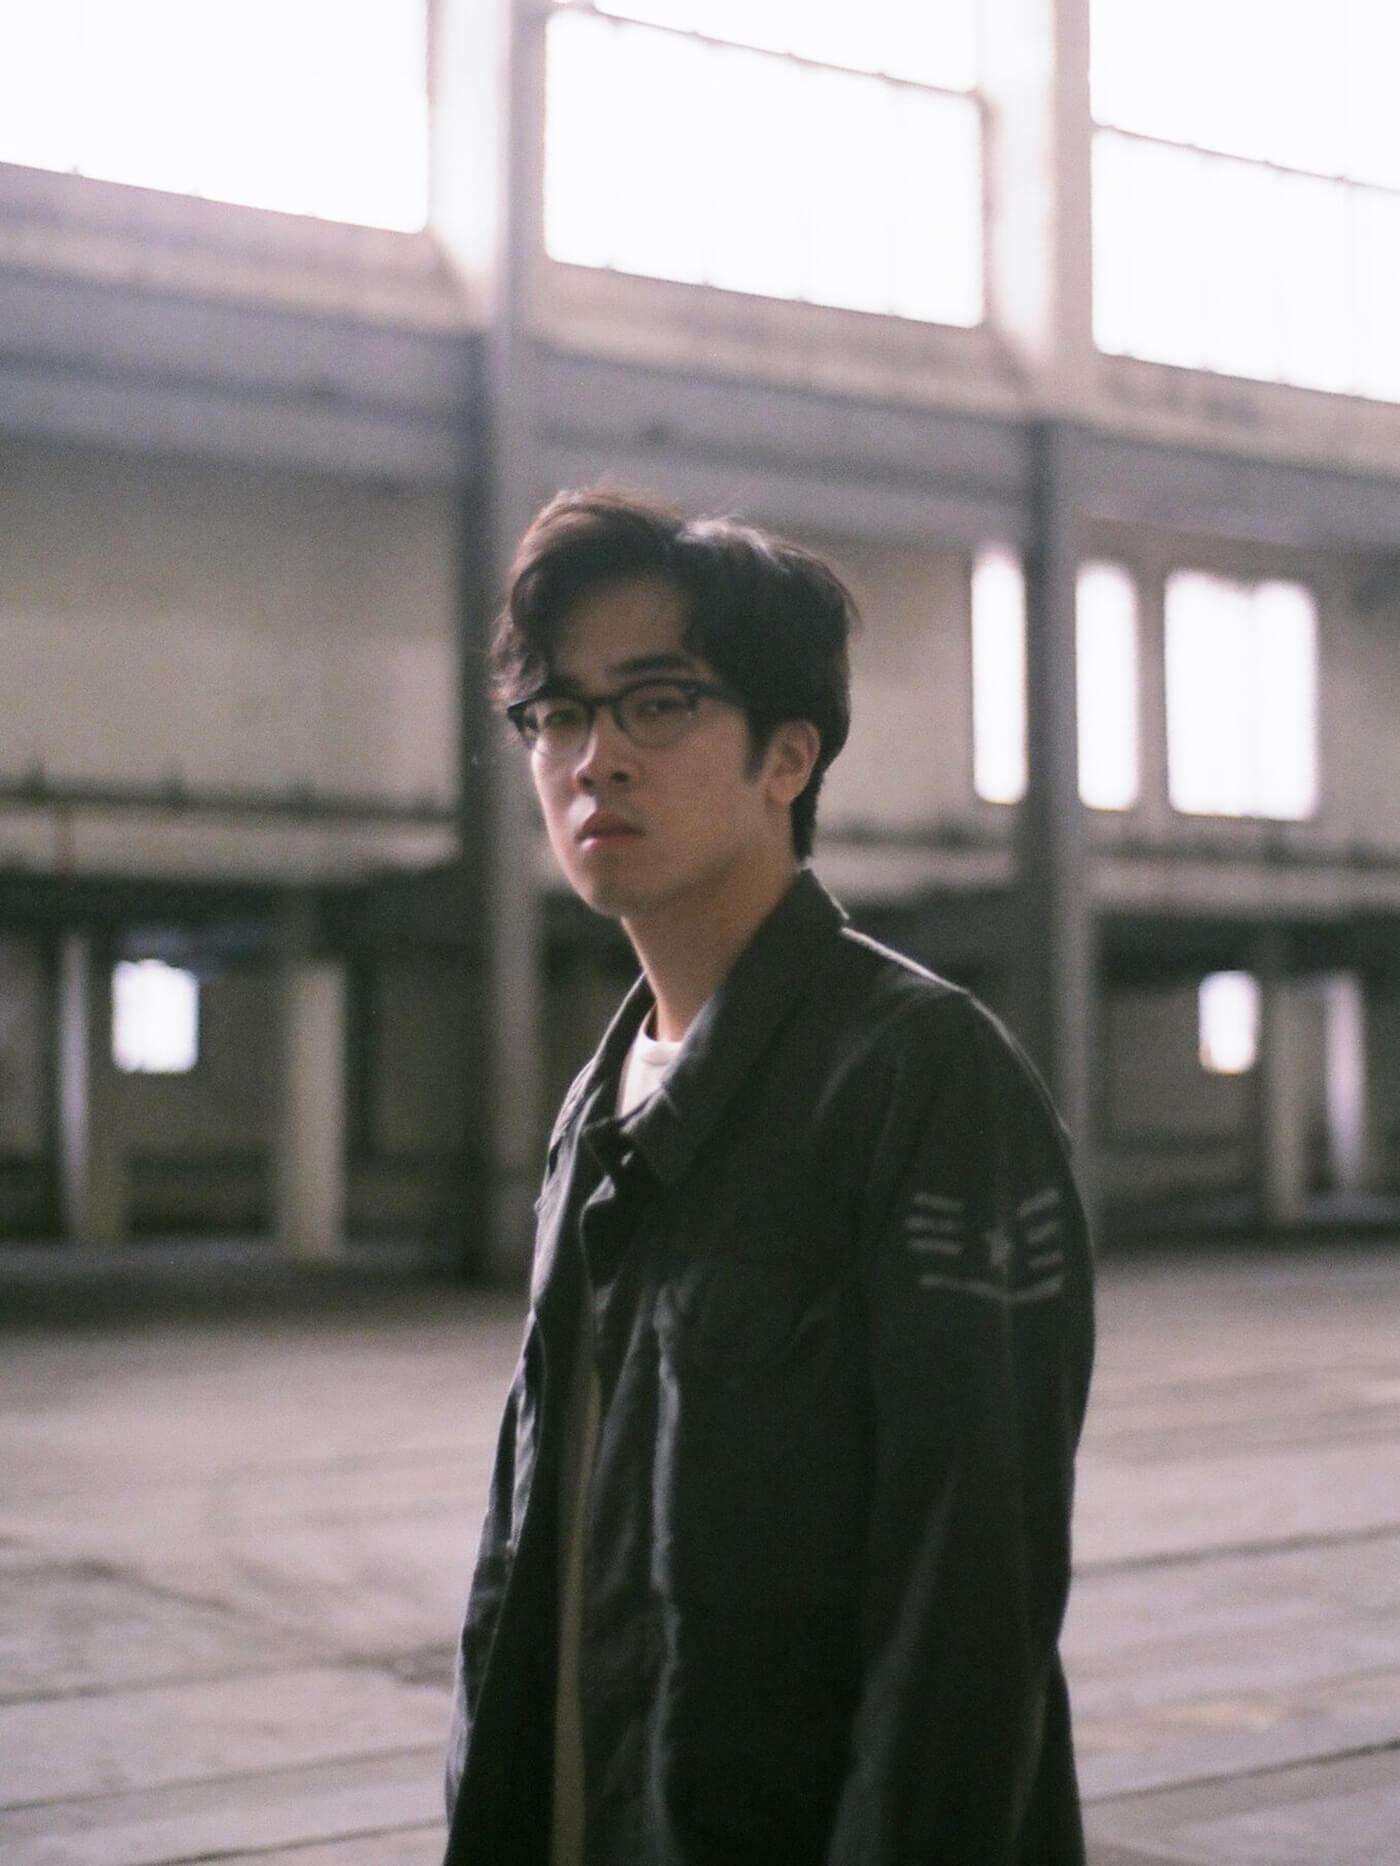 Charlie Lim abandoned location portrait shot